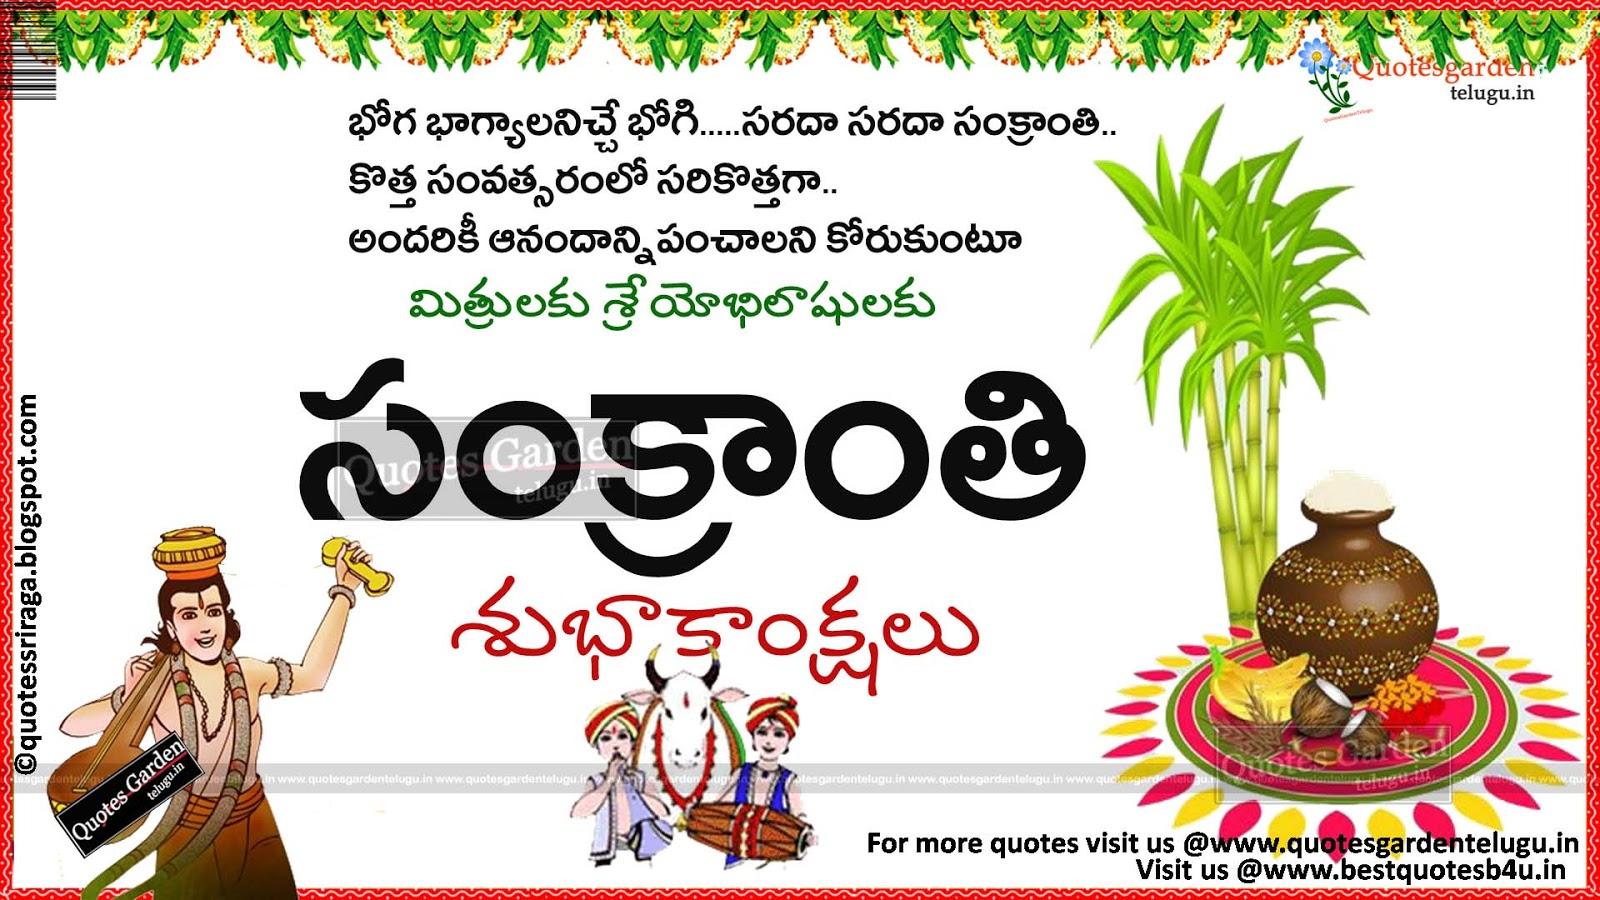 Happy Makar Sankranti 2017 Greetings In Telugu Quotes Garden